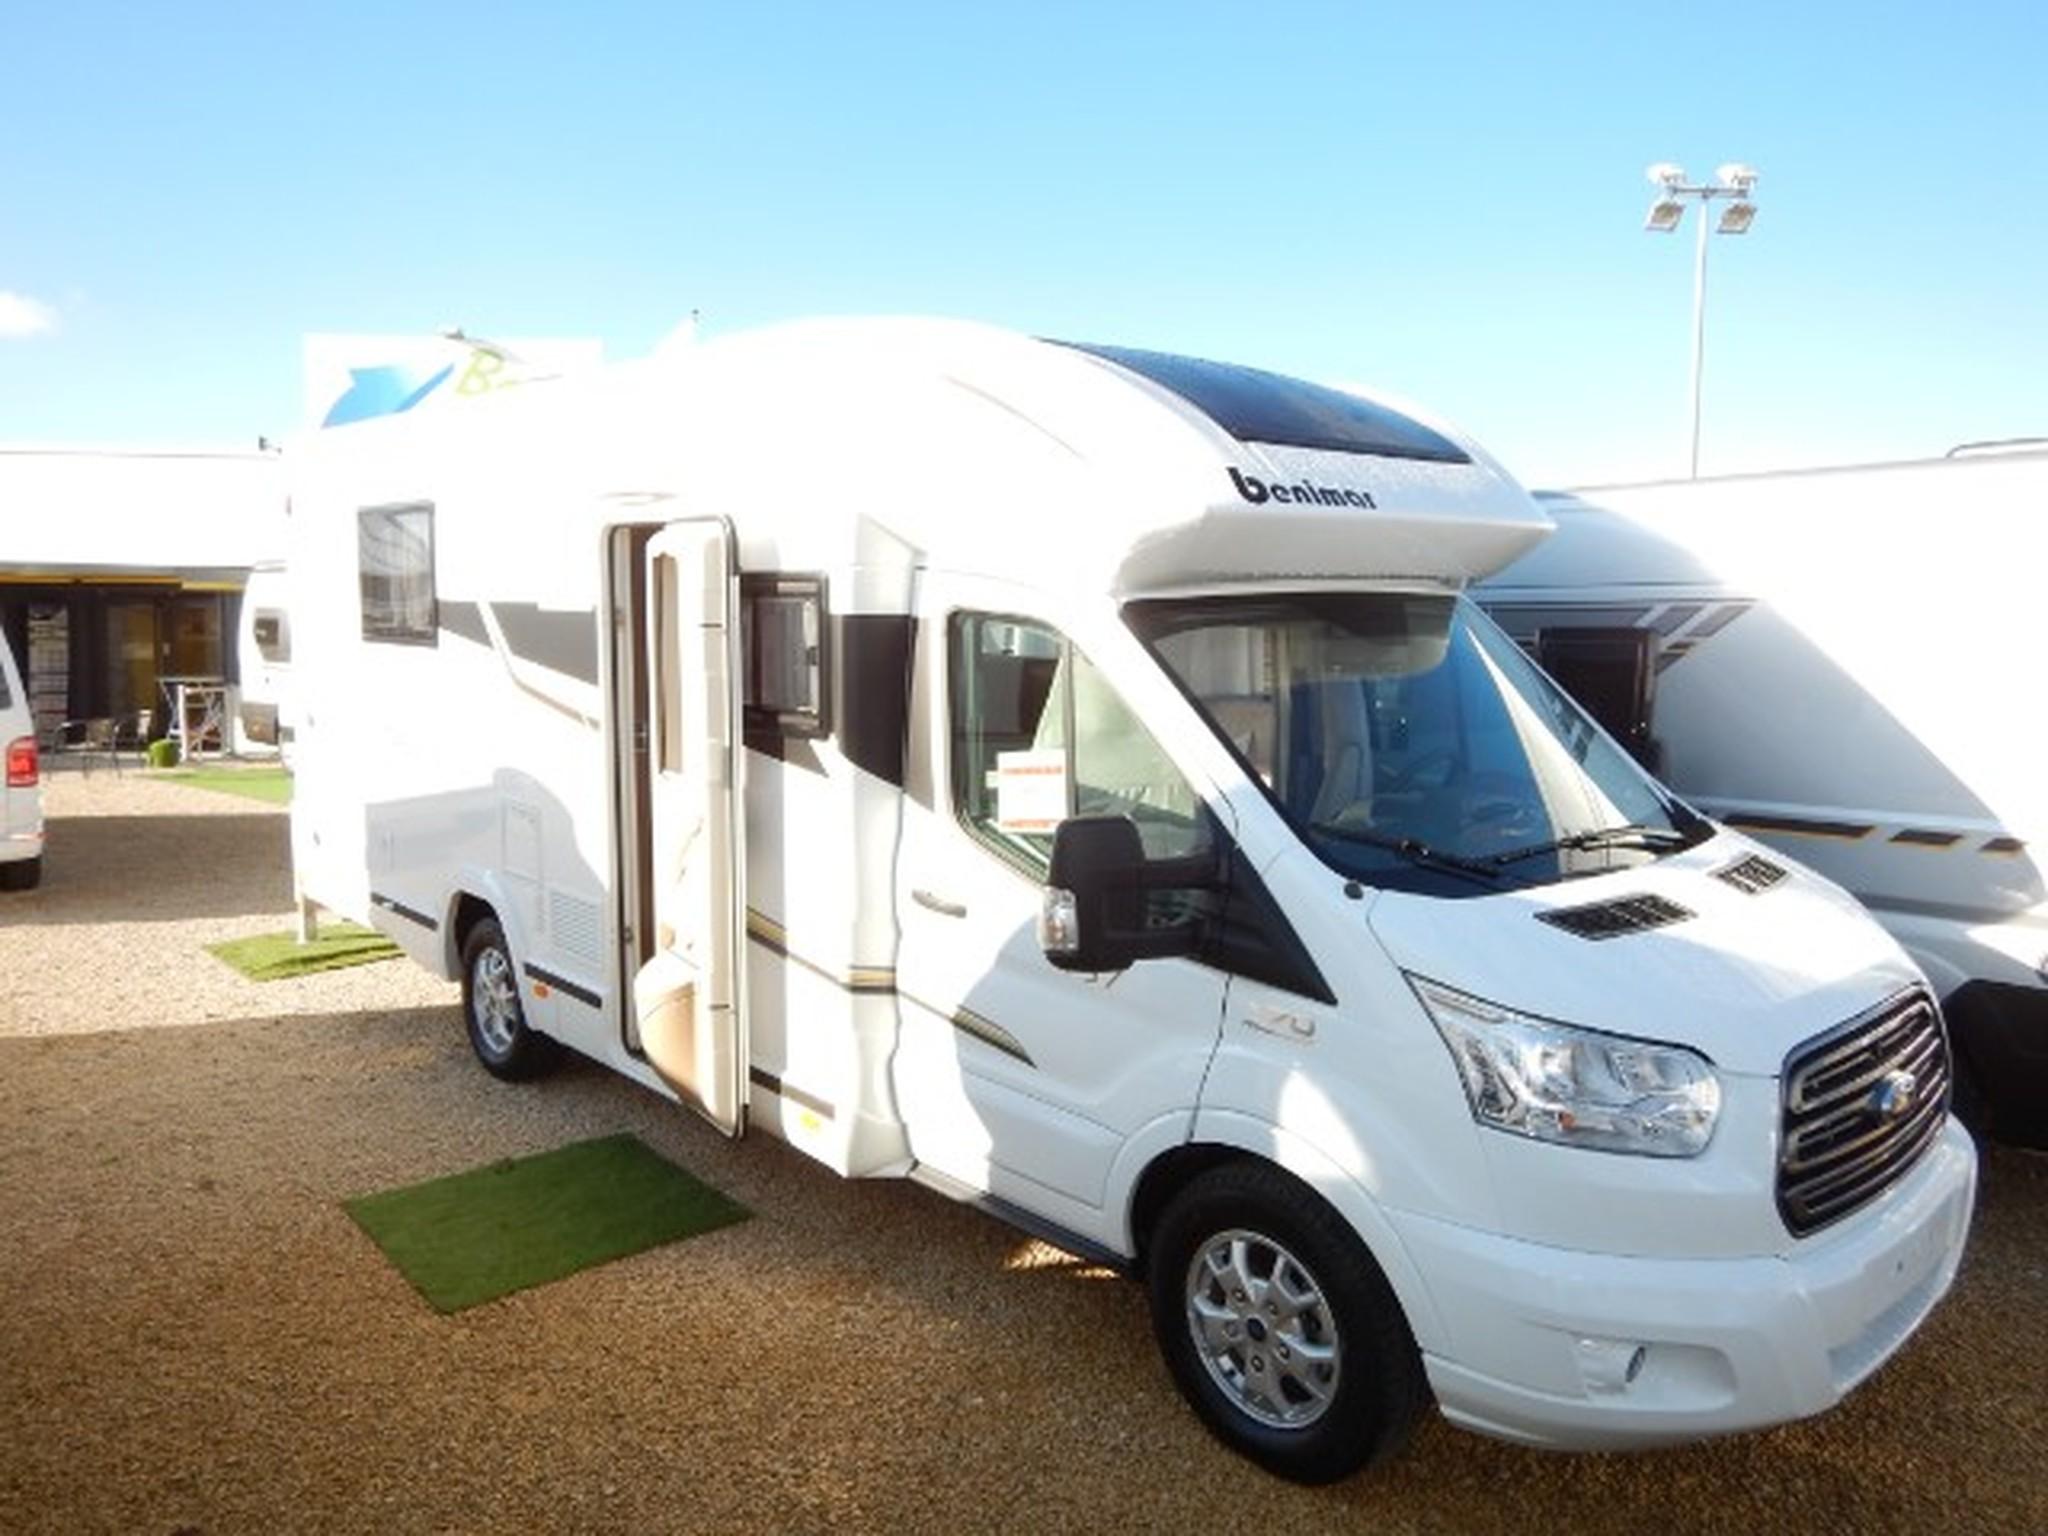 benimar tessoro 497 neuf de 2019 autres camping car en vente saint maur indre 36. Black Bedroom Furniture Sets. Home Design Ideas